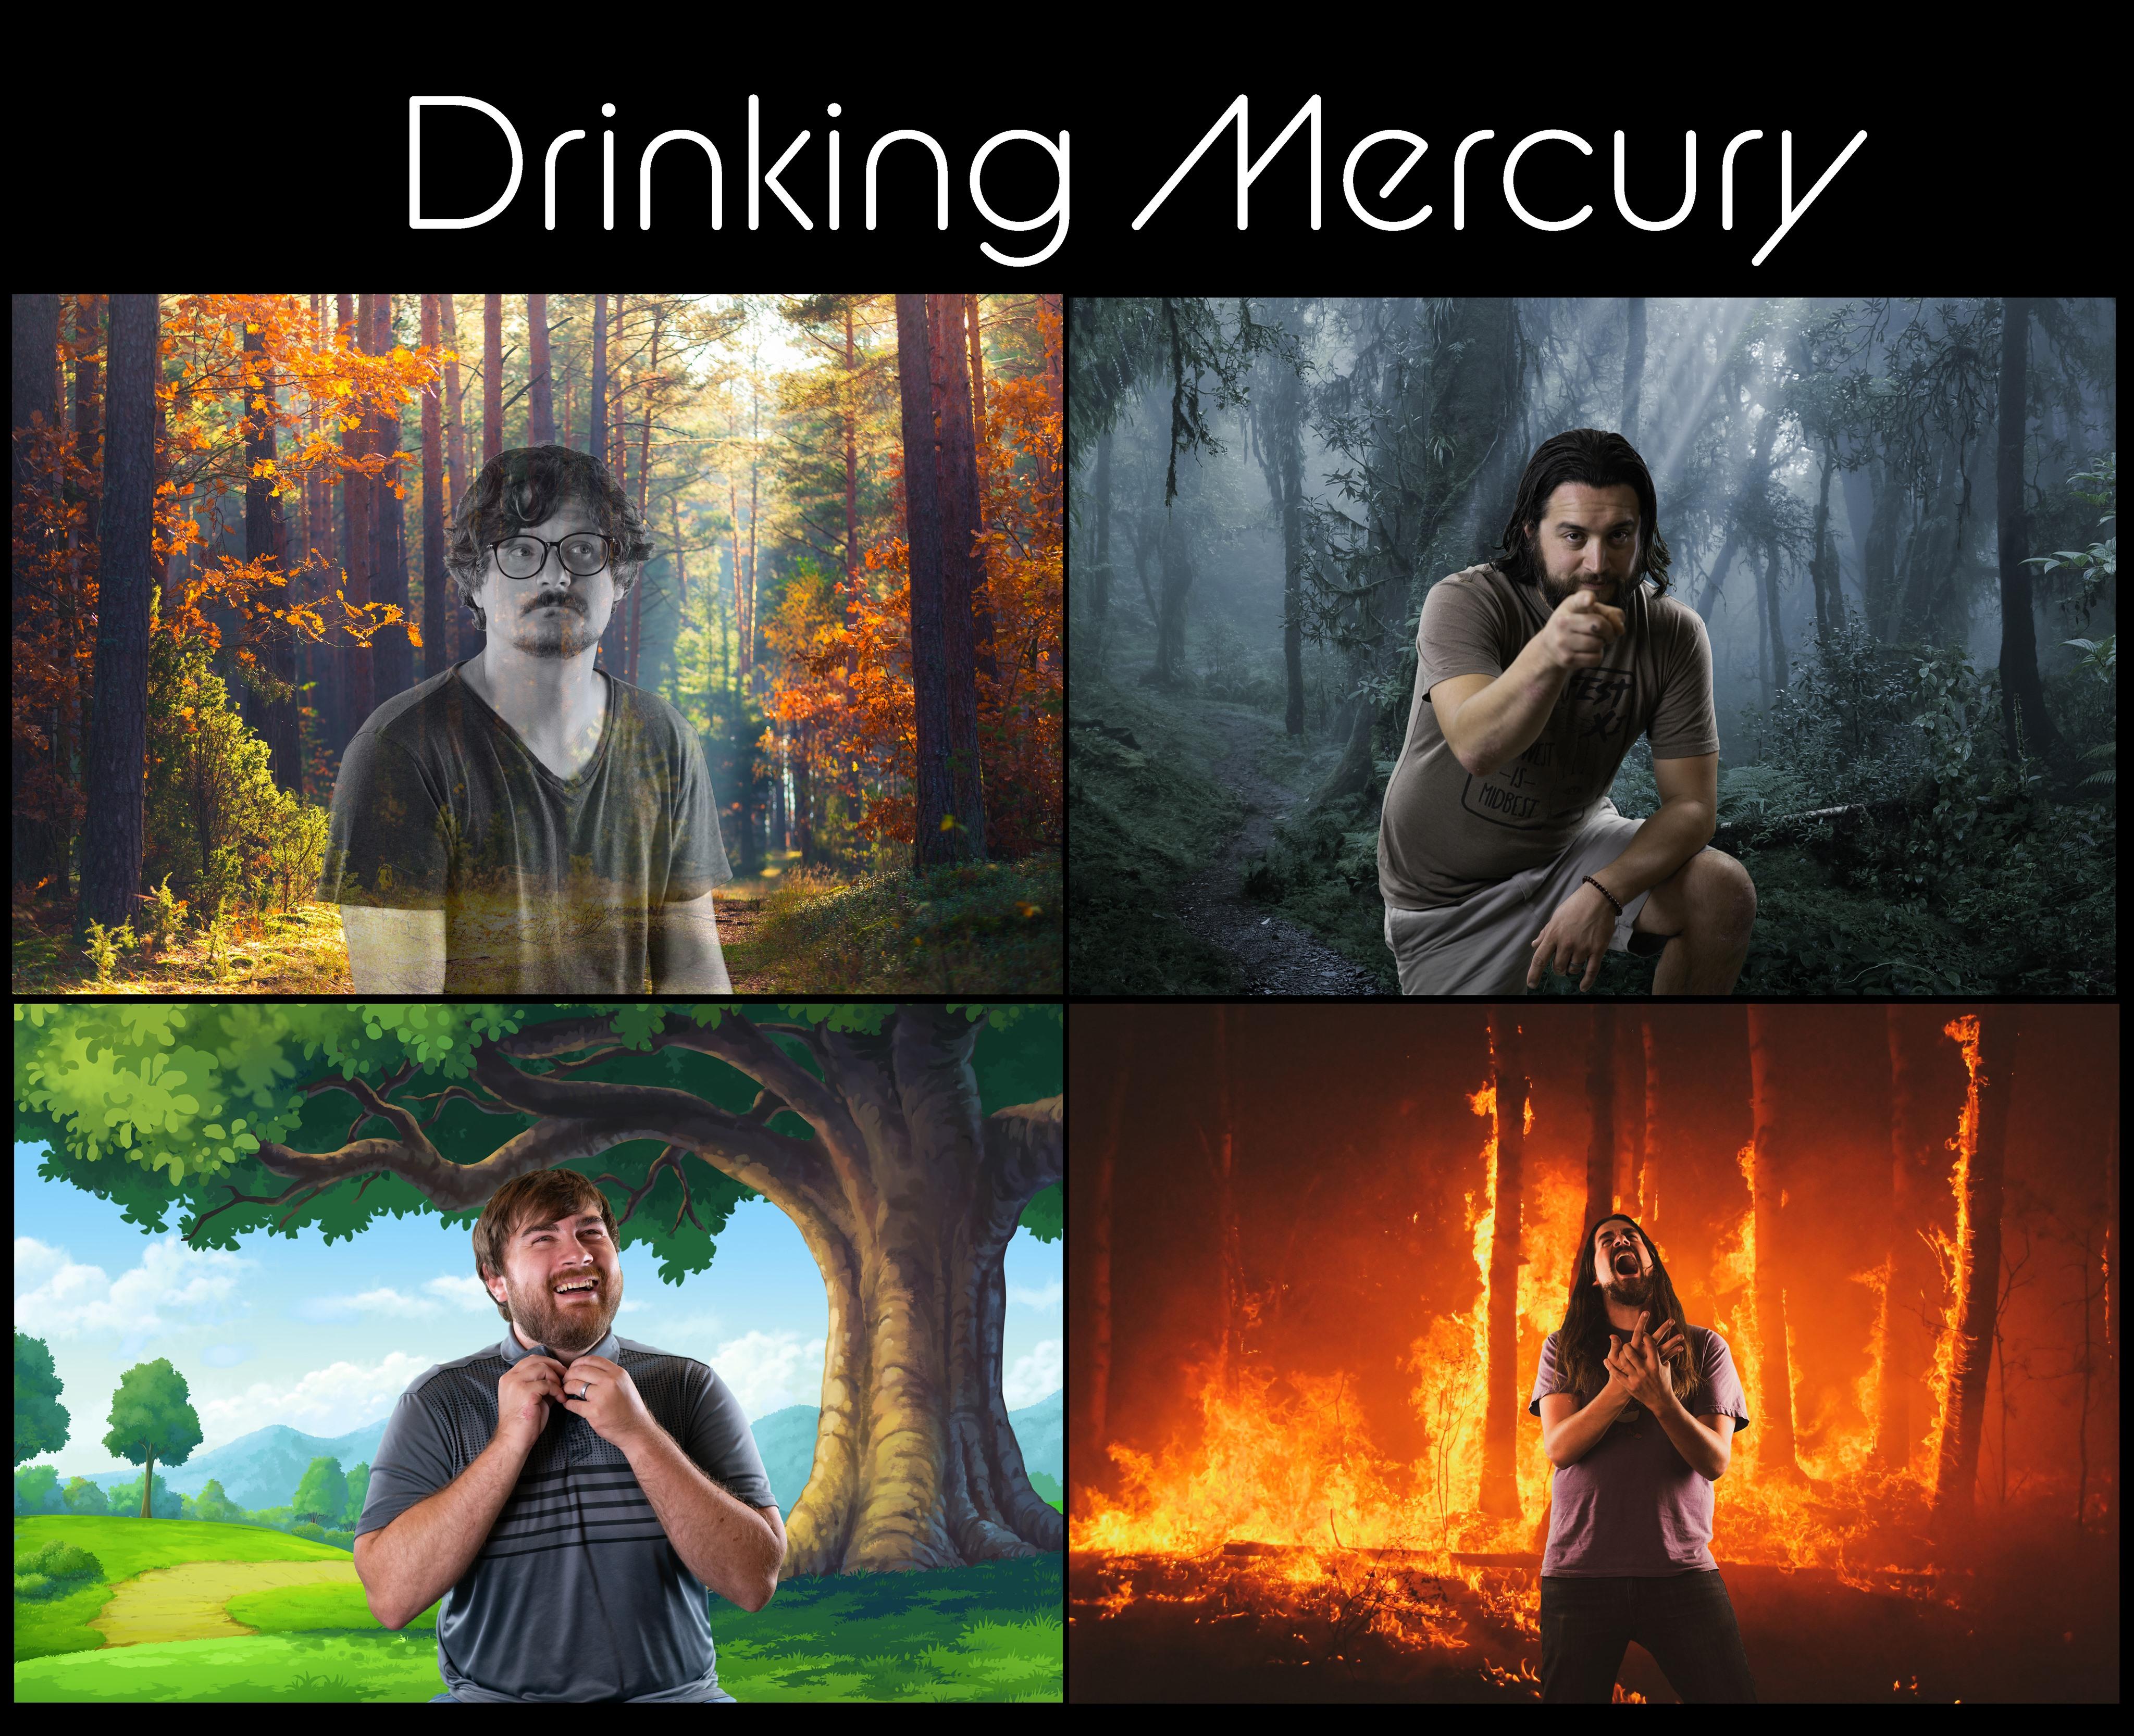 Drinking-Mercury-Very-Serious